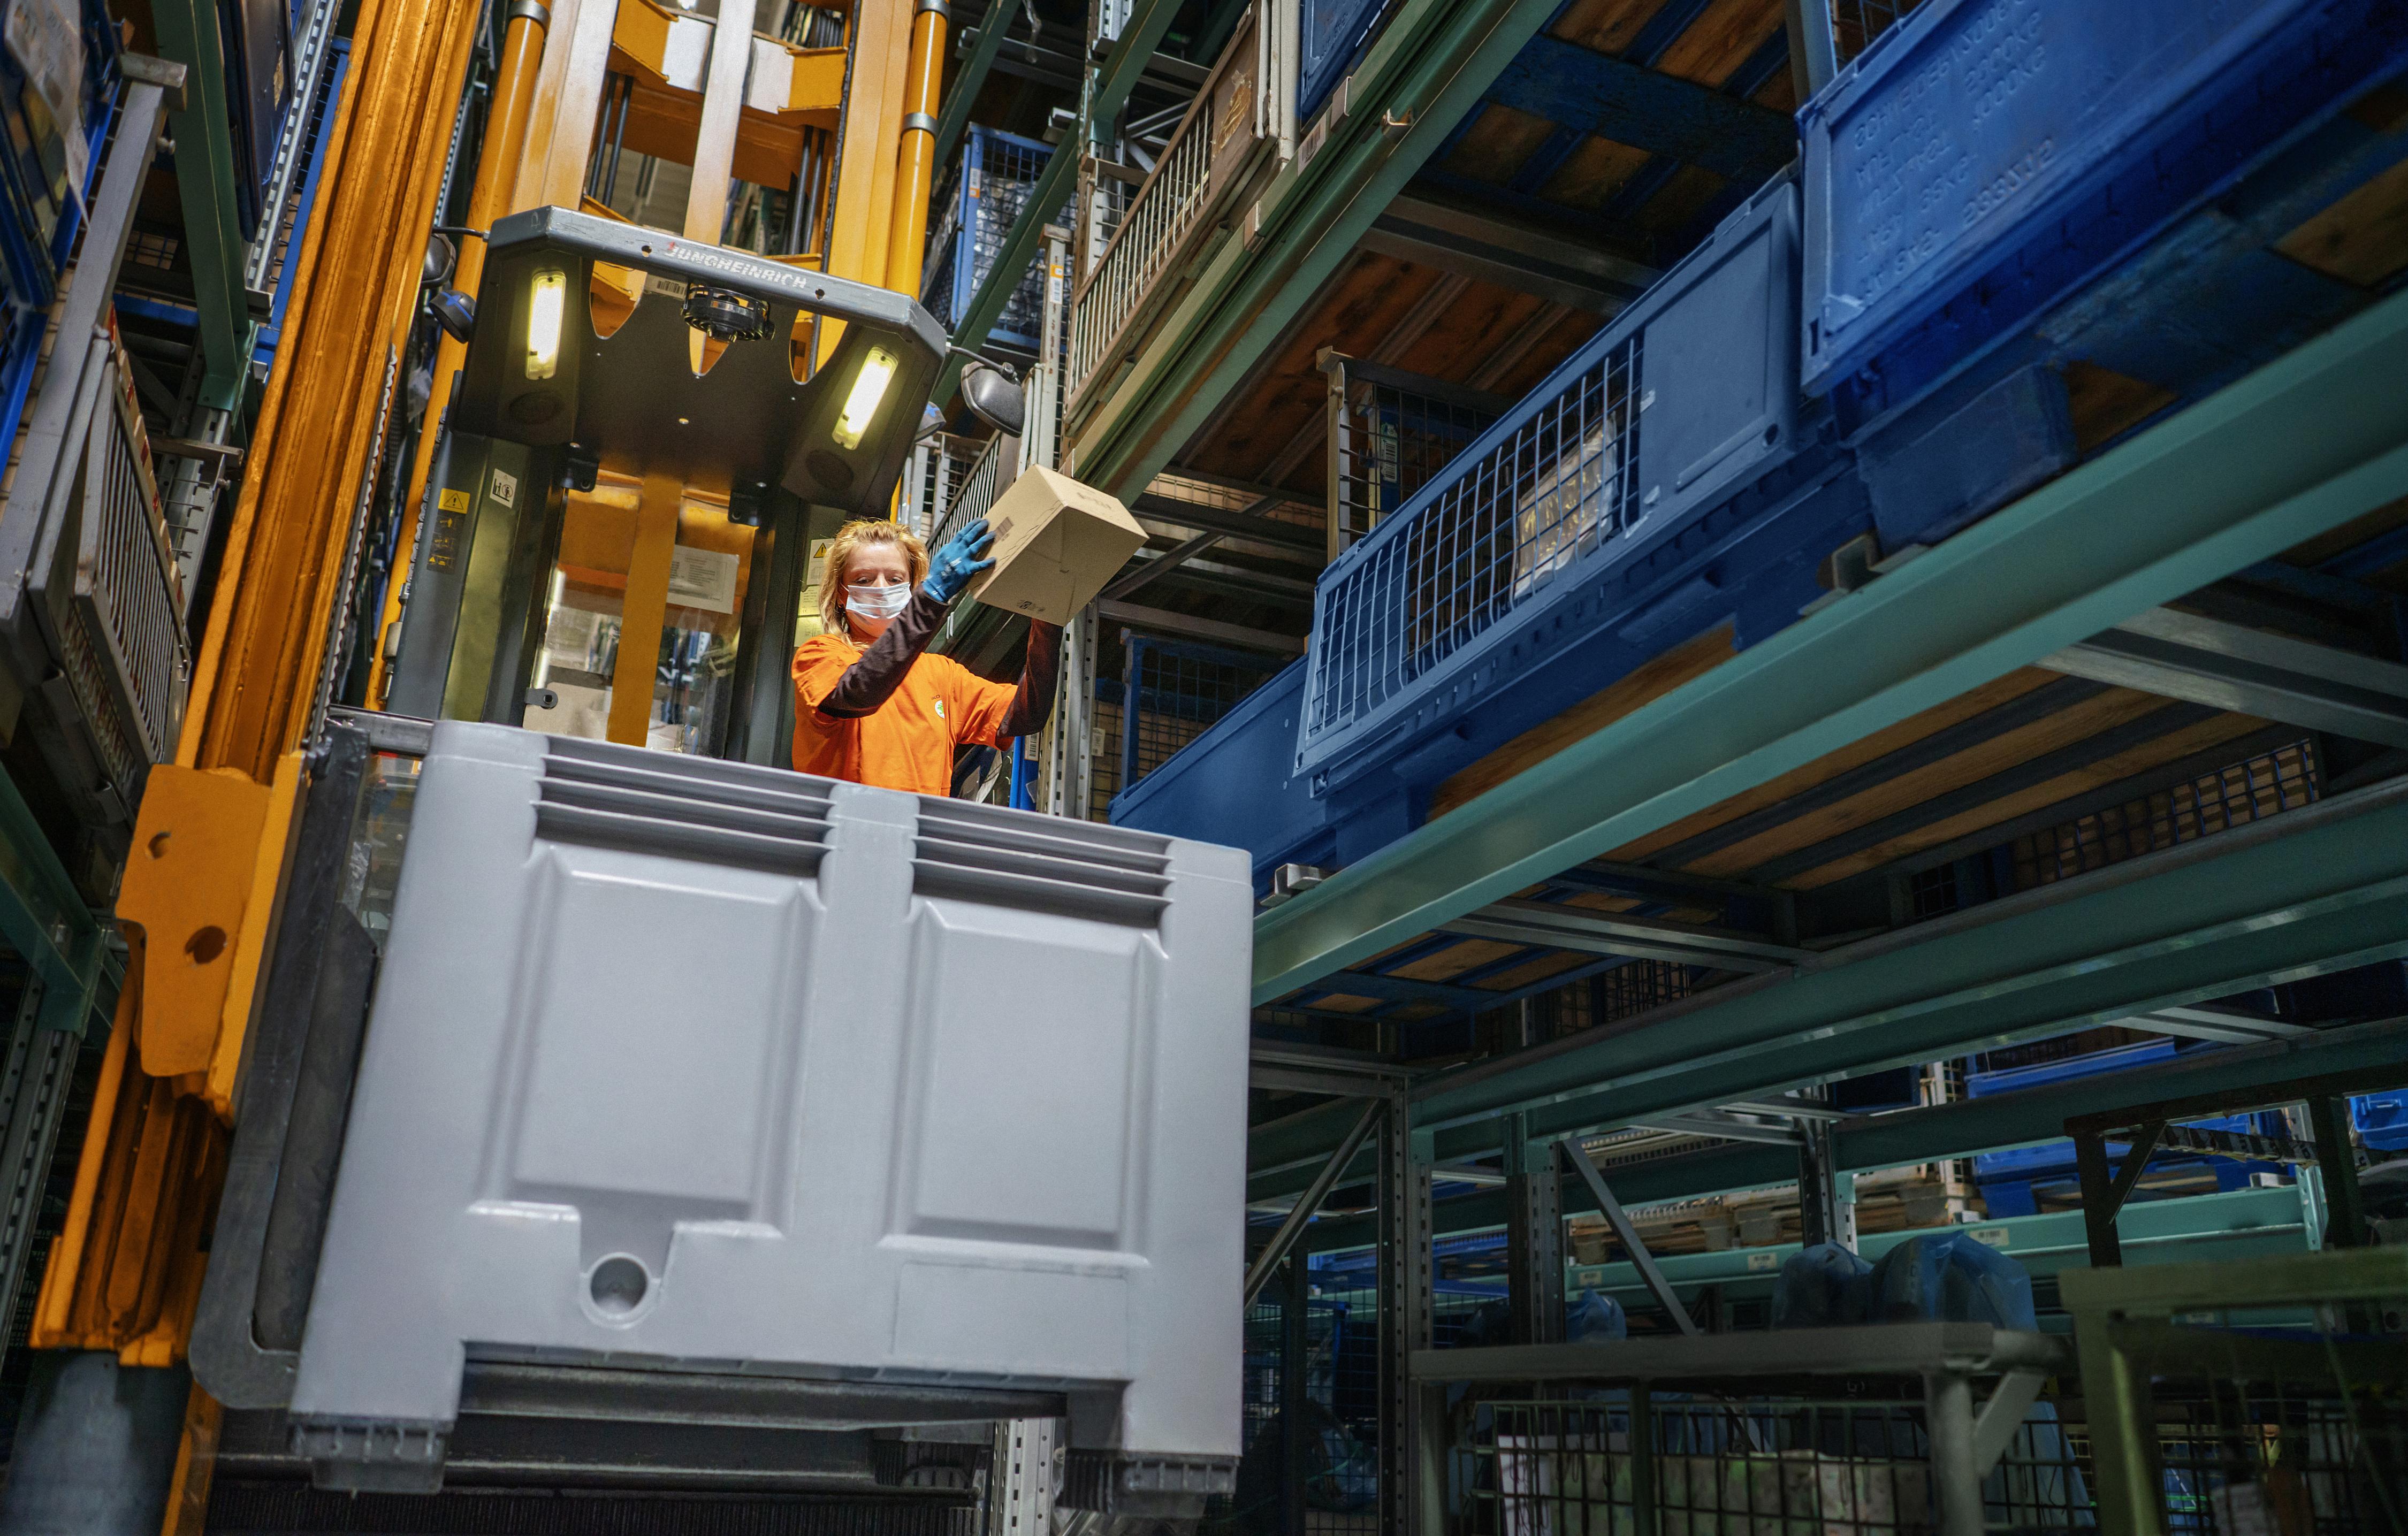 SKODA guarantees reliable supply of genuine parts worldwide despite coronavirus restrictions - Image 1